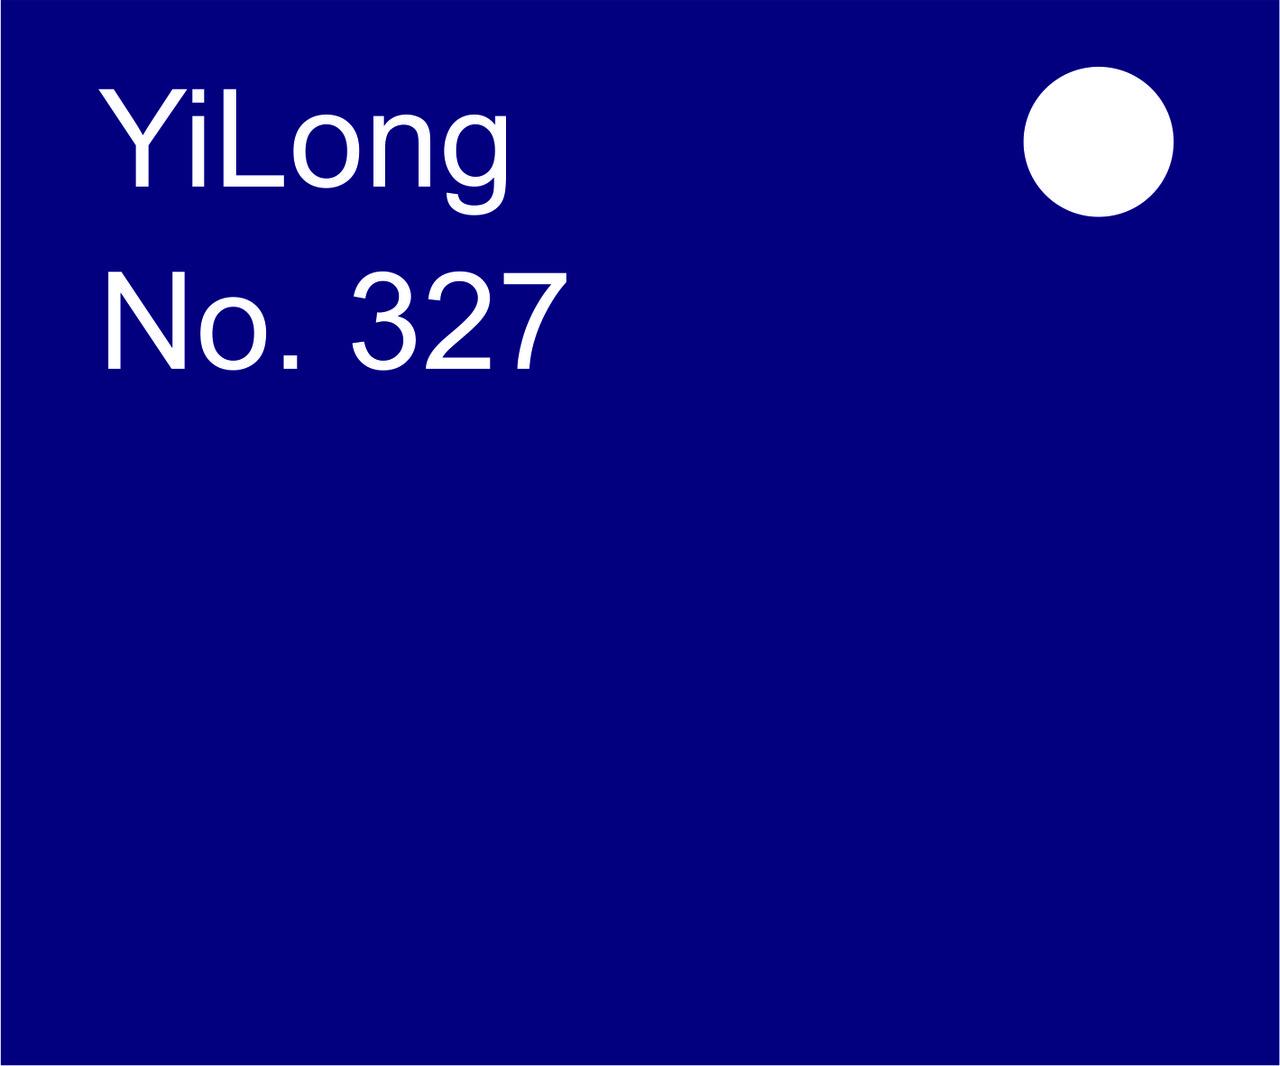 Акрил темно-синий 2мм (1,25м х 2,48м)